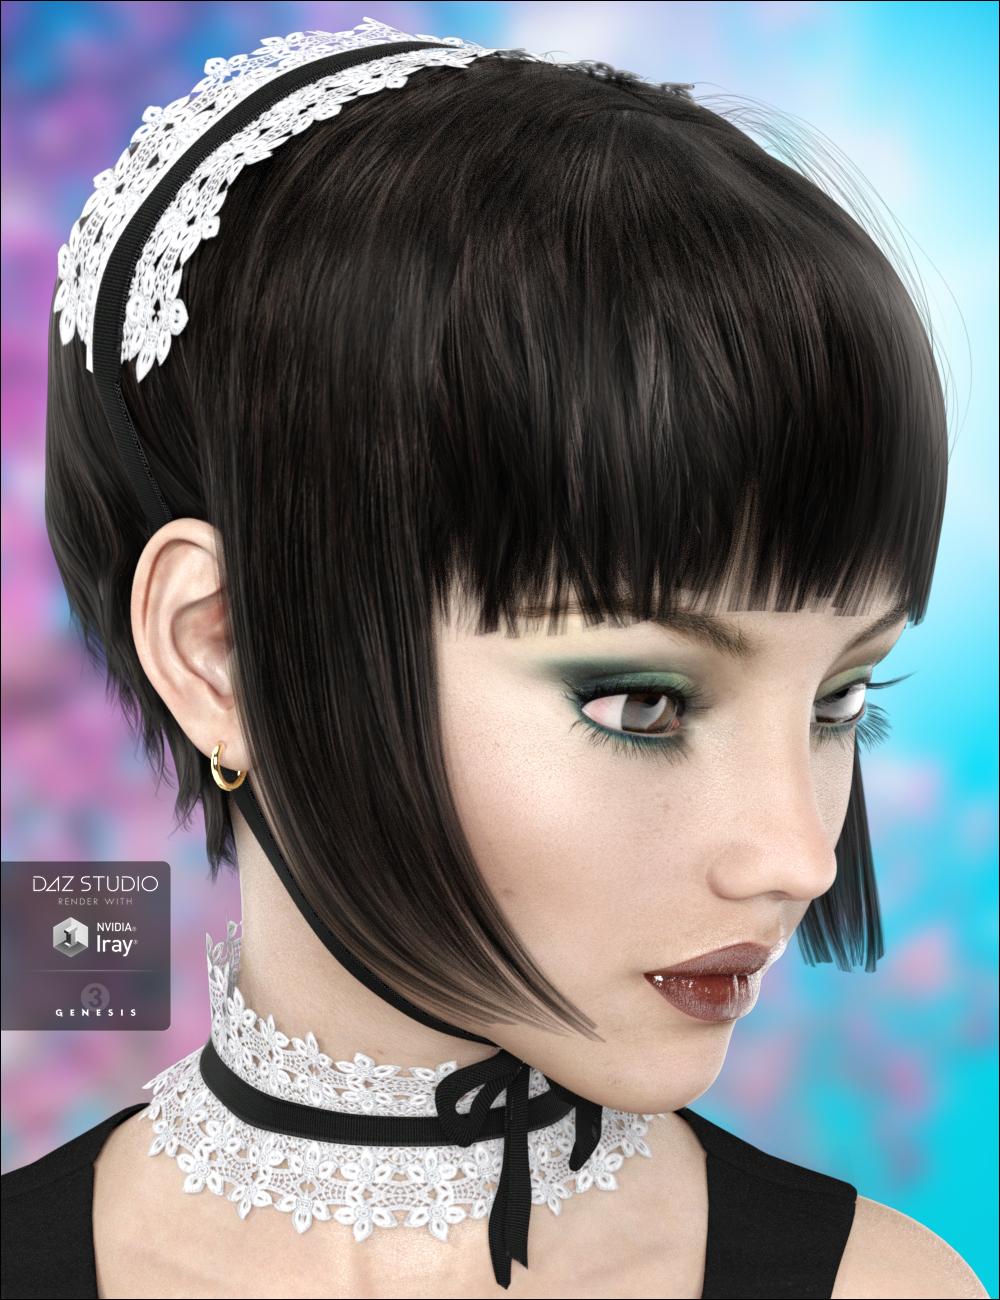 Juliette Hair by: DarkStarBurningMindVision G.D.S., 3D Models by Daz 3D